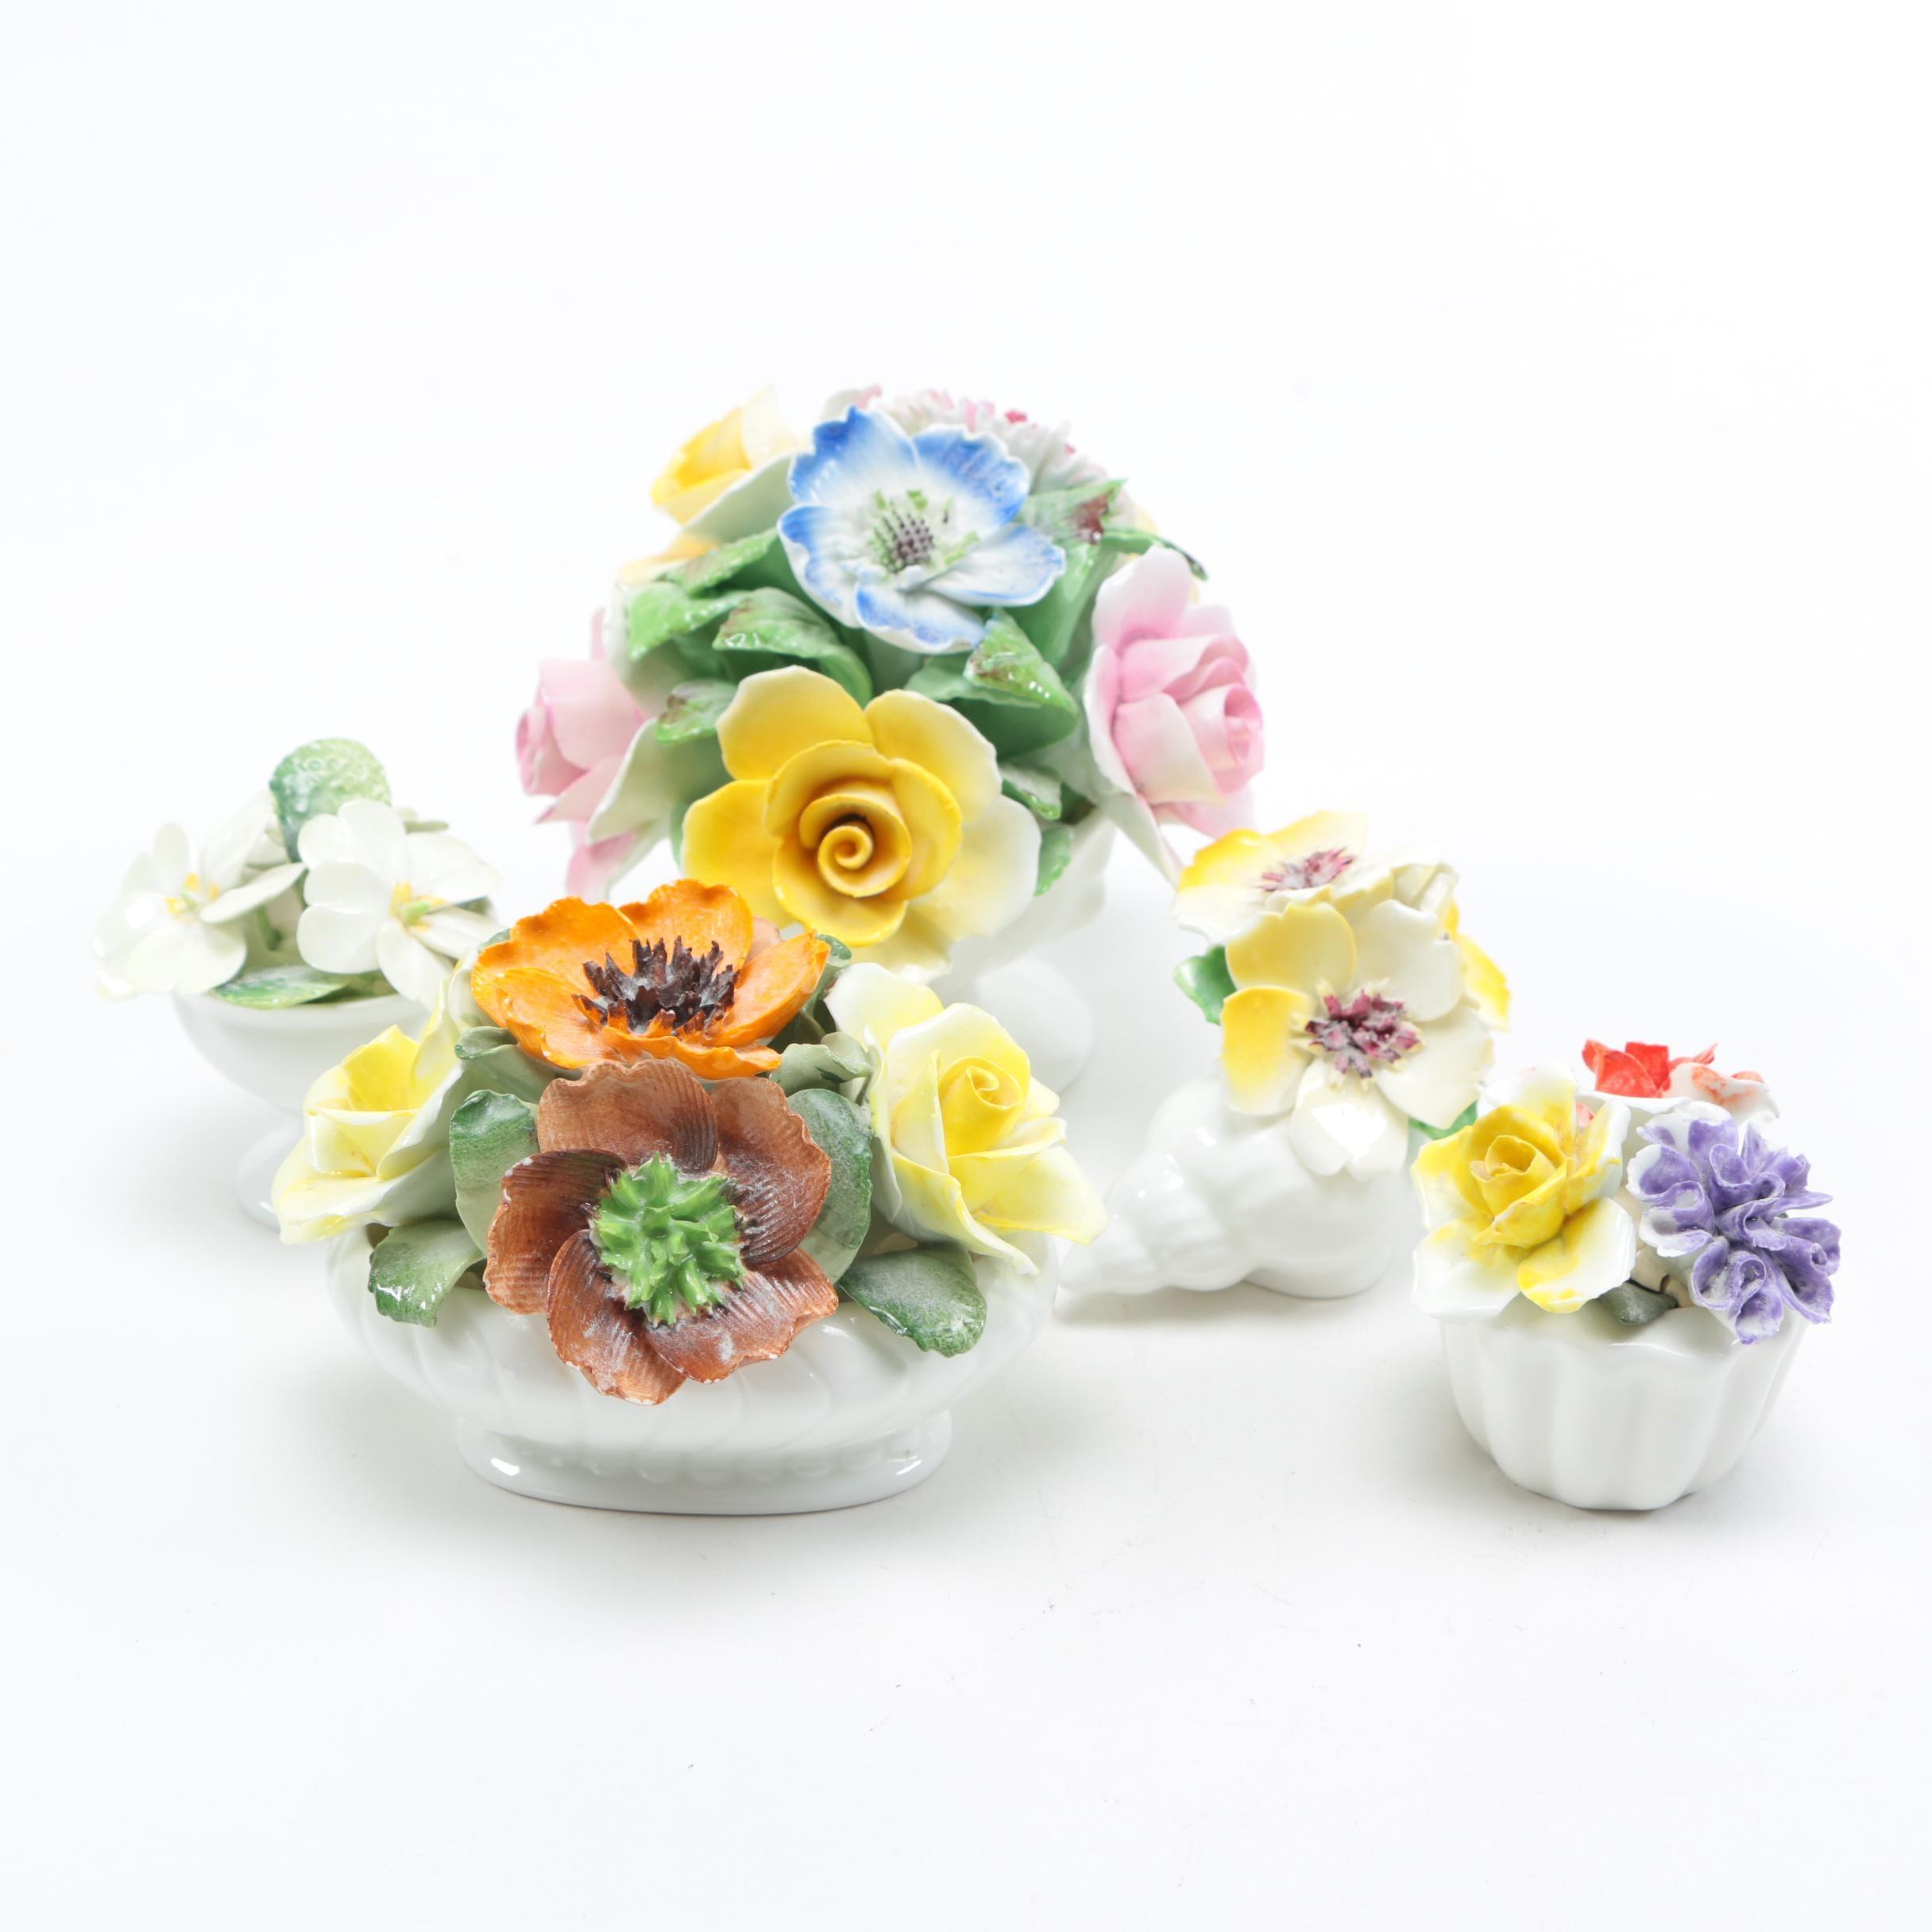 Vintage English Bone China Floral Baskets